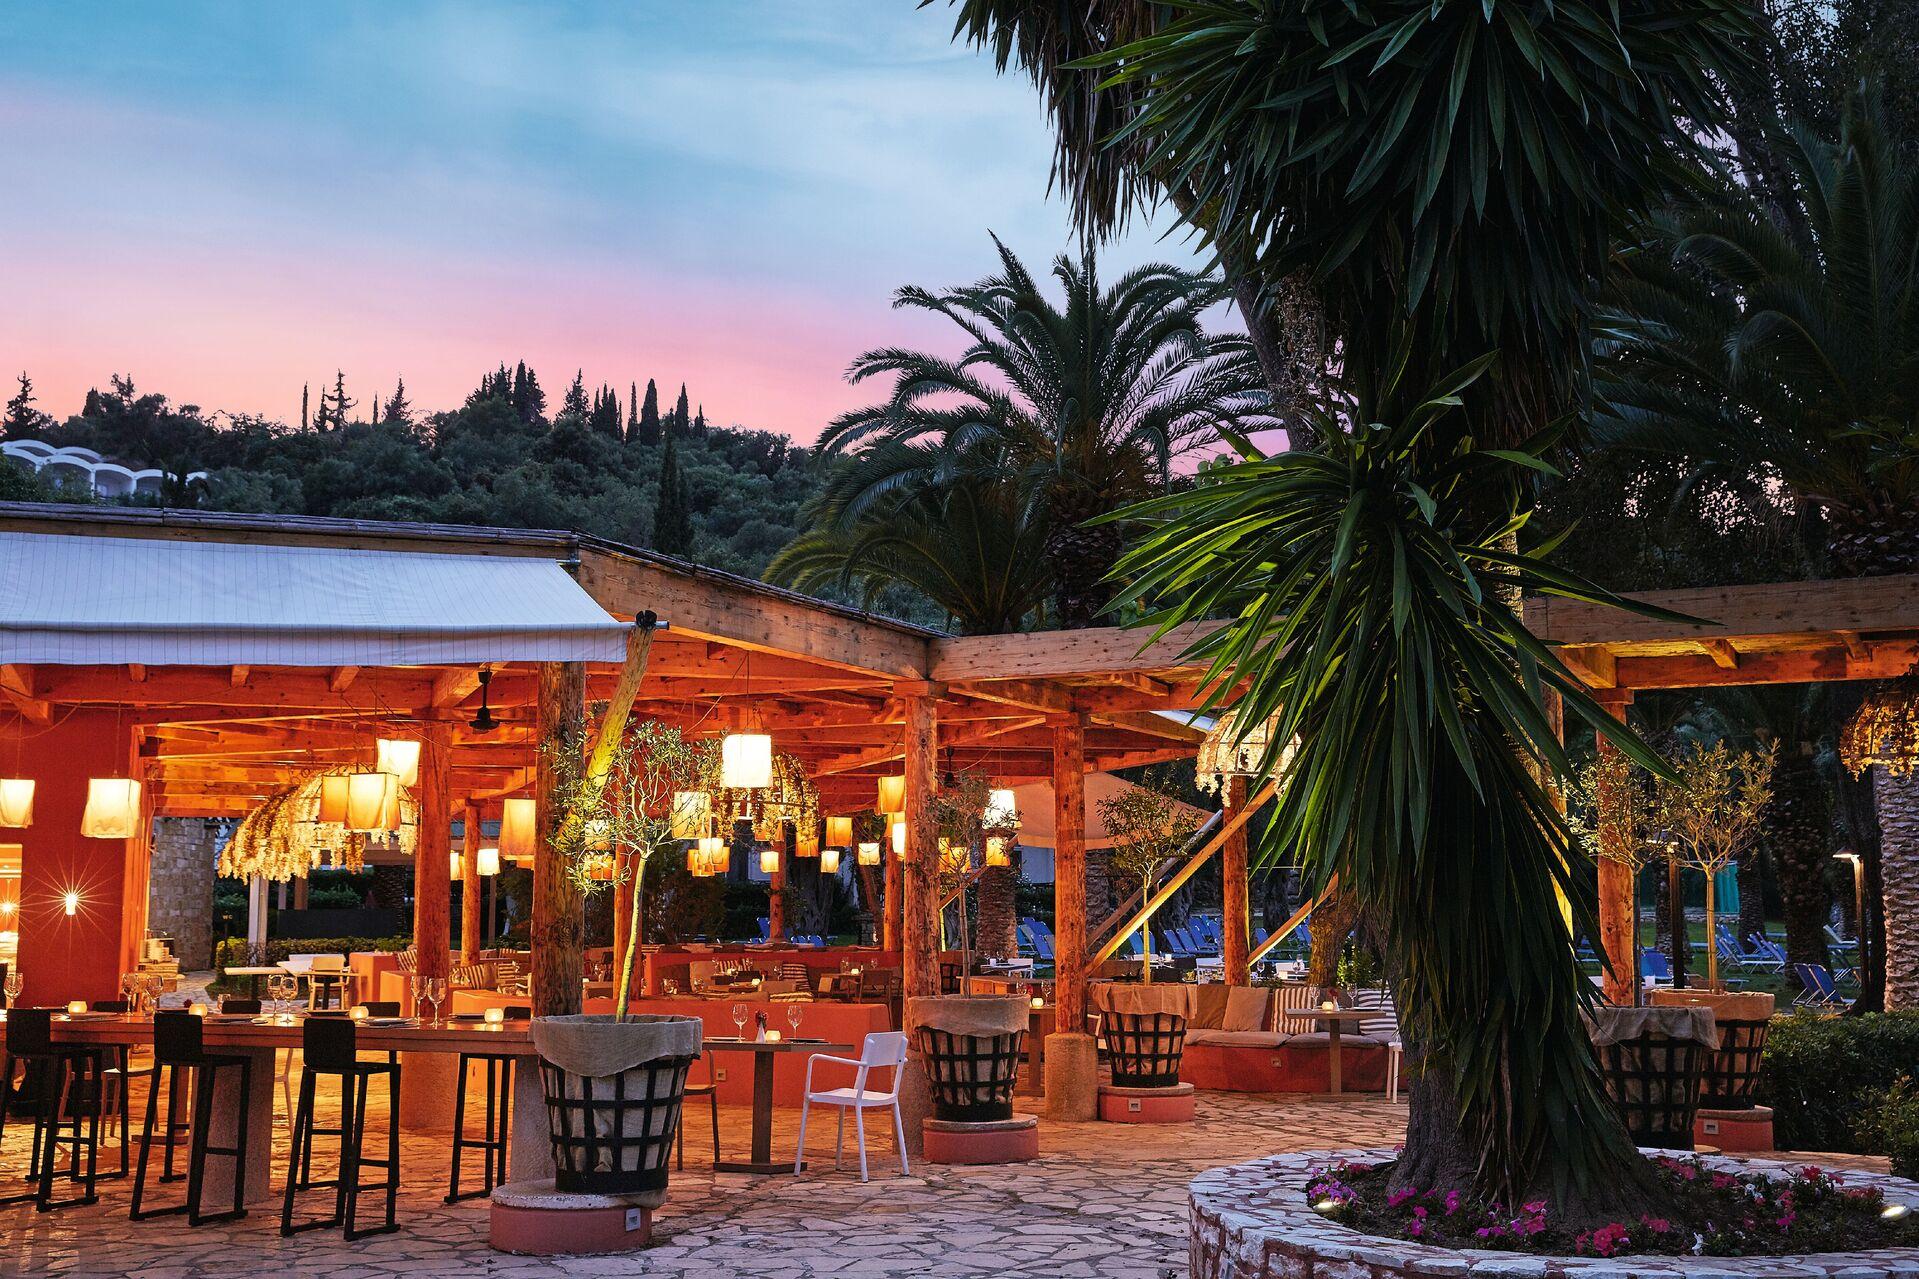 https://cms.satur.sk/data/imgs/tour_image/orig/07-giardini-di-olivo-restaurant-at-sunset_72dpi-1924849.jpg